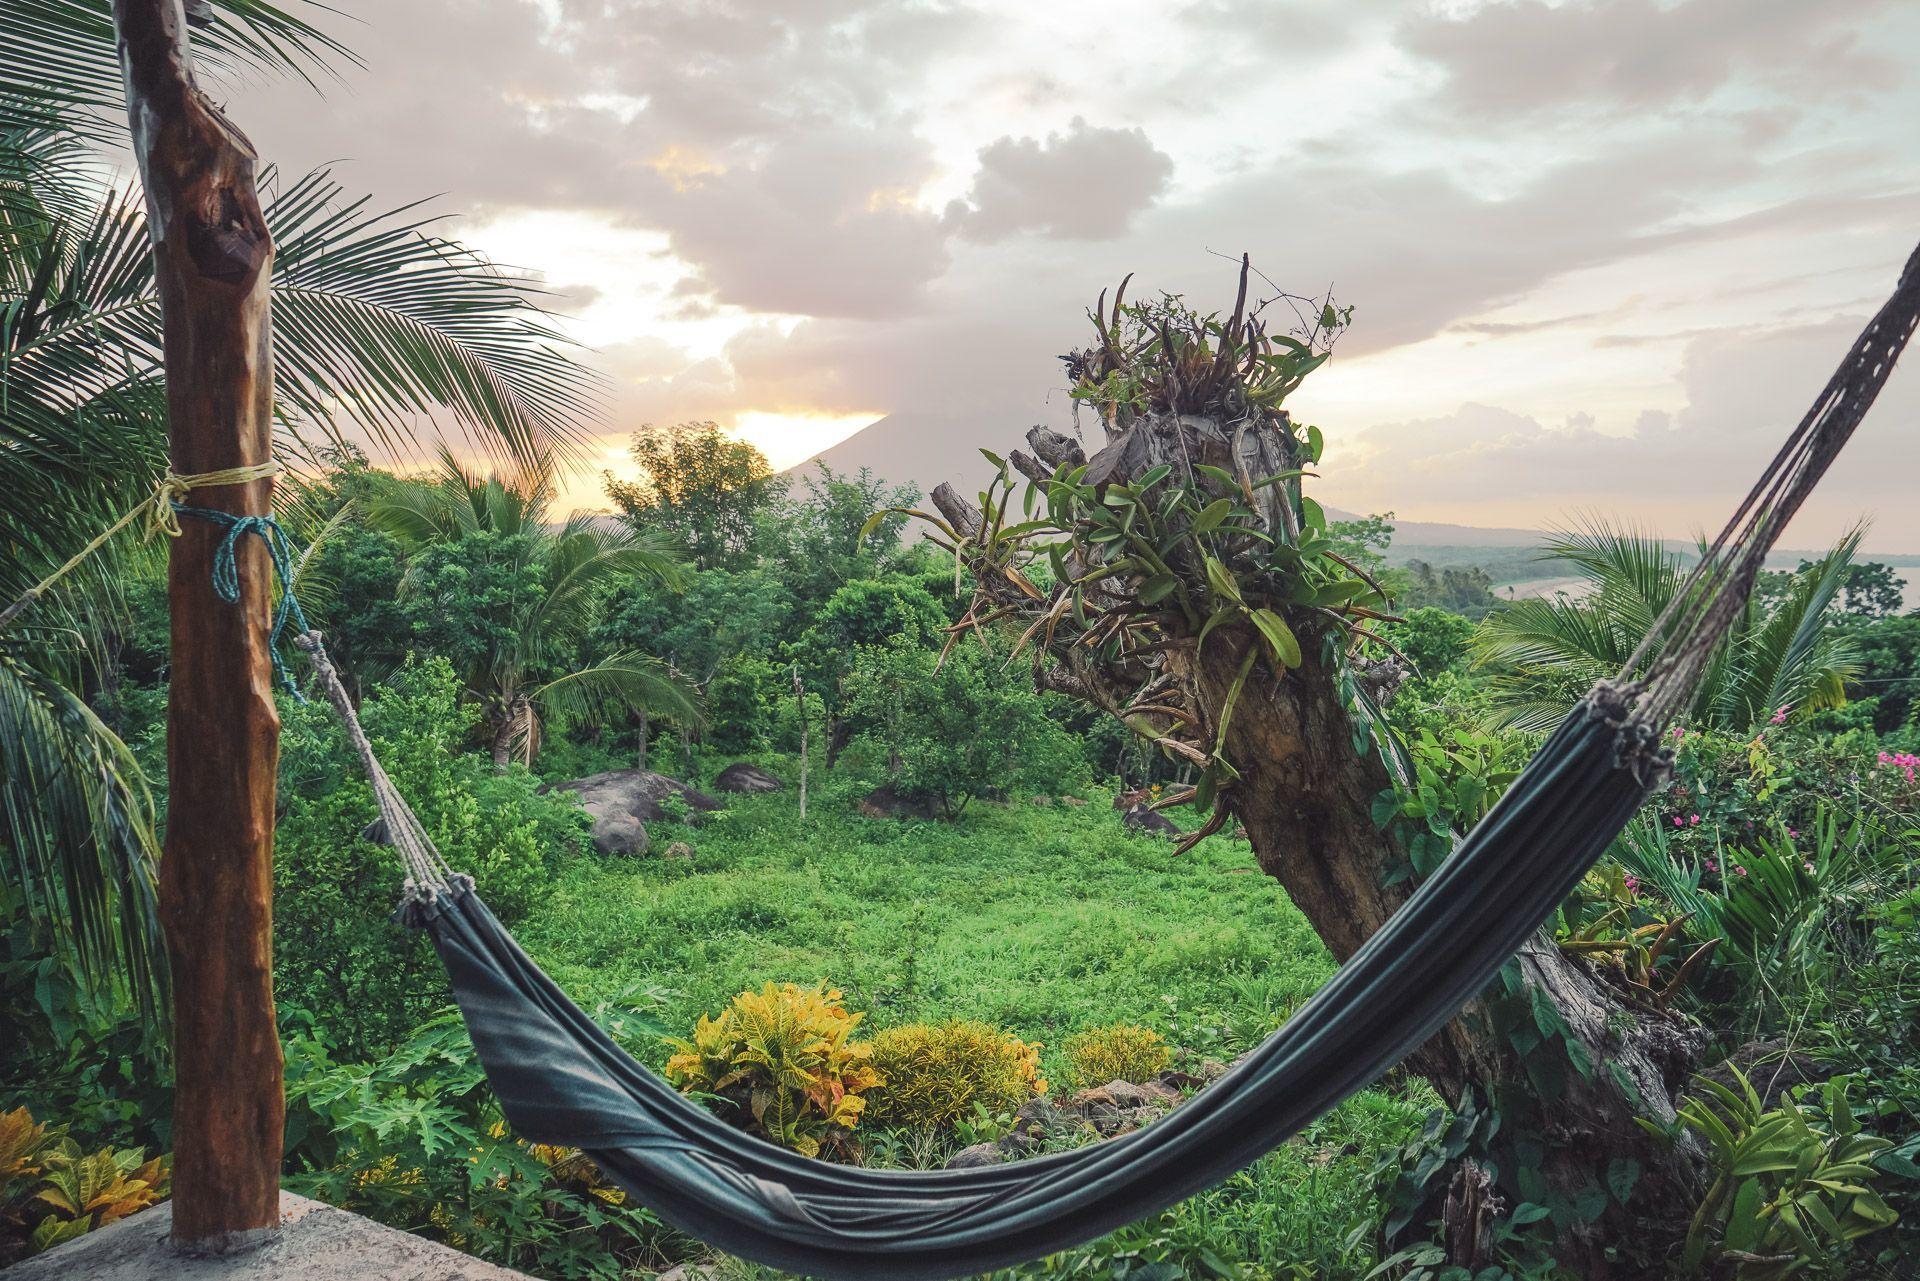 Lesvoyageuses-Nicaragua-Sans-Visa-Marocains-28